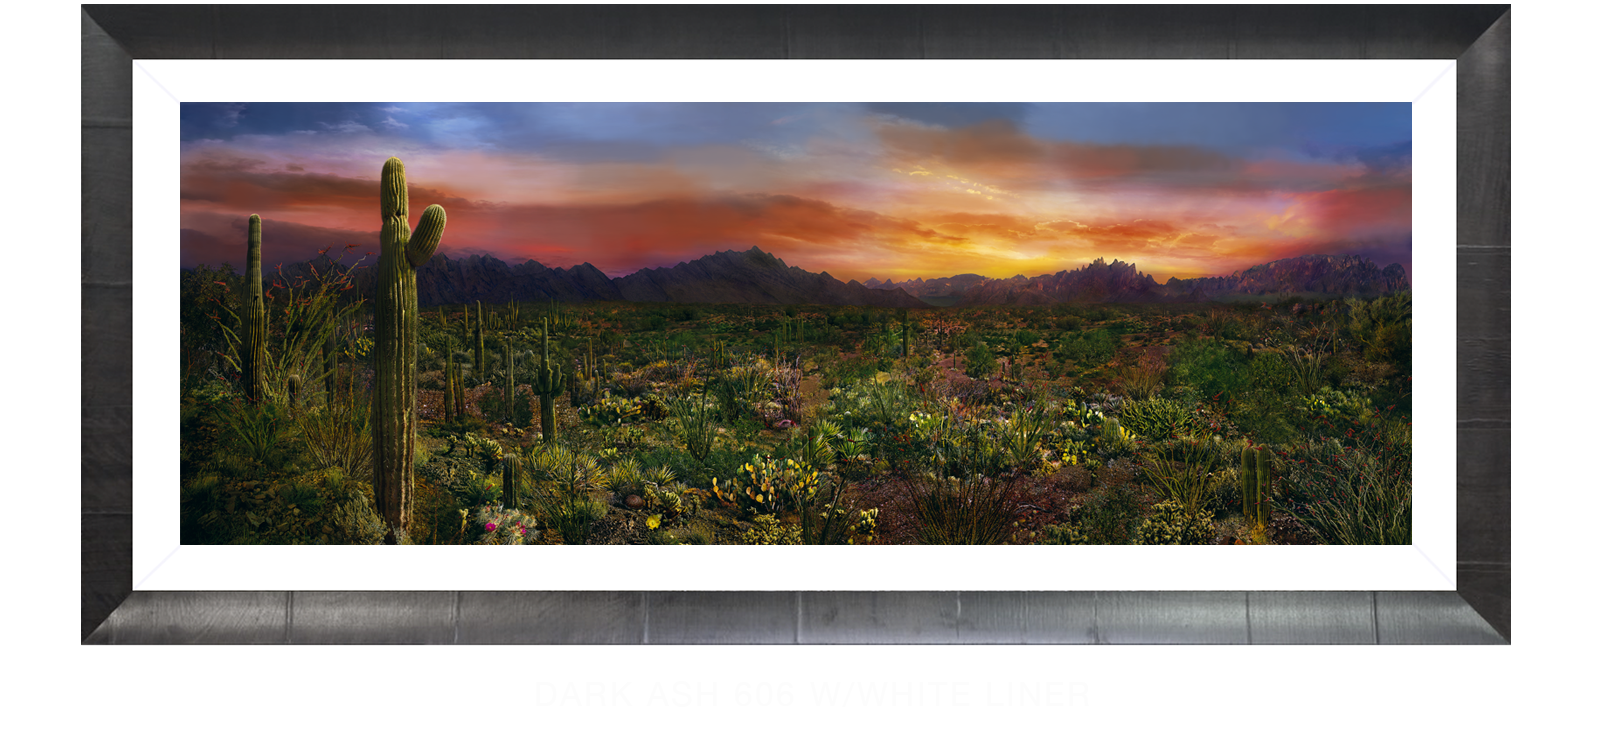 18EDEN VERNALIS Dark Ash 606 w_Wht Liner T